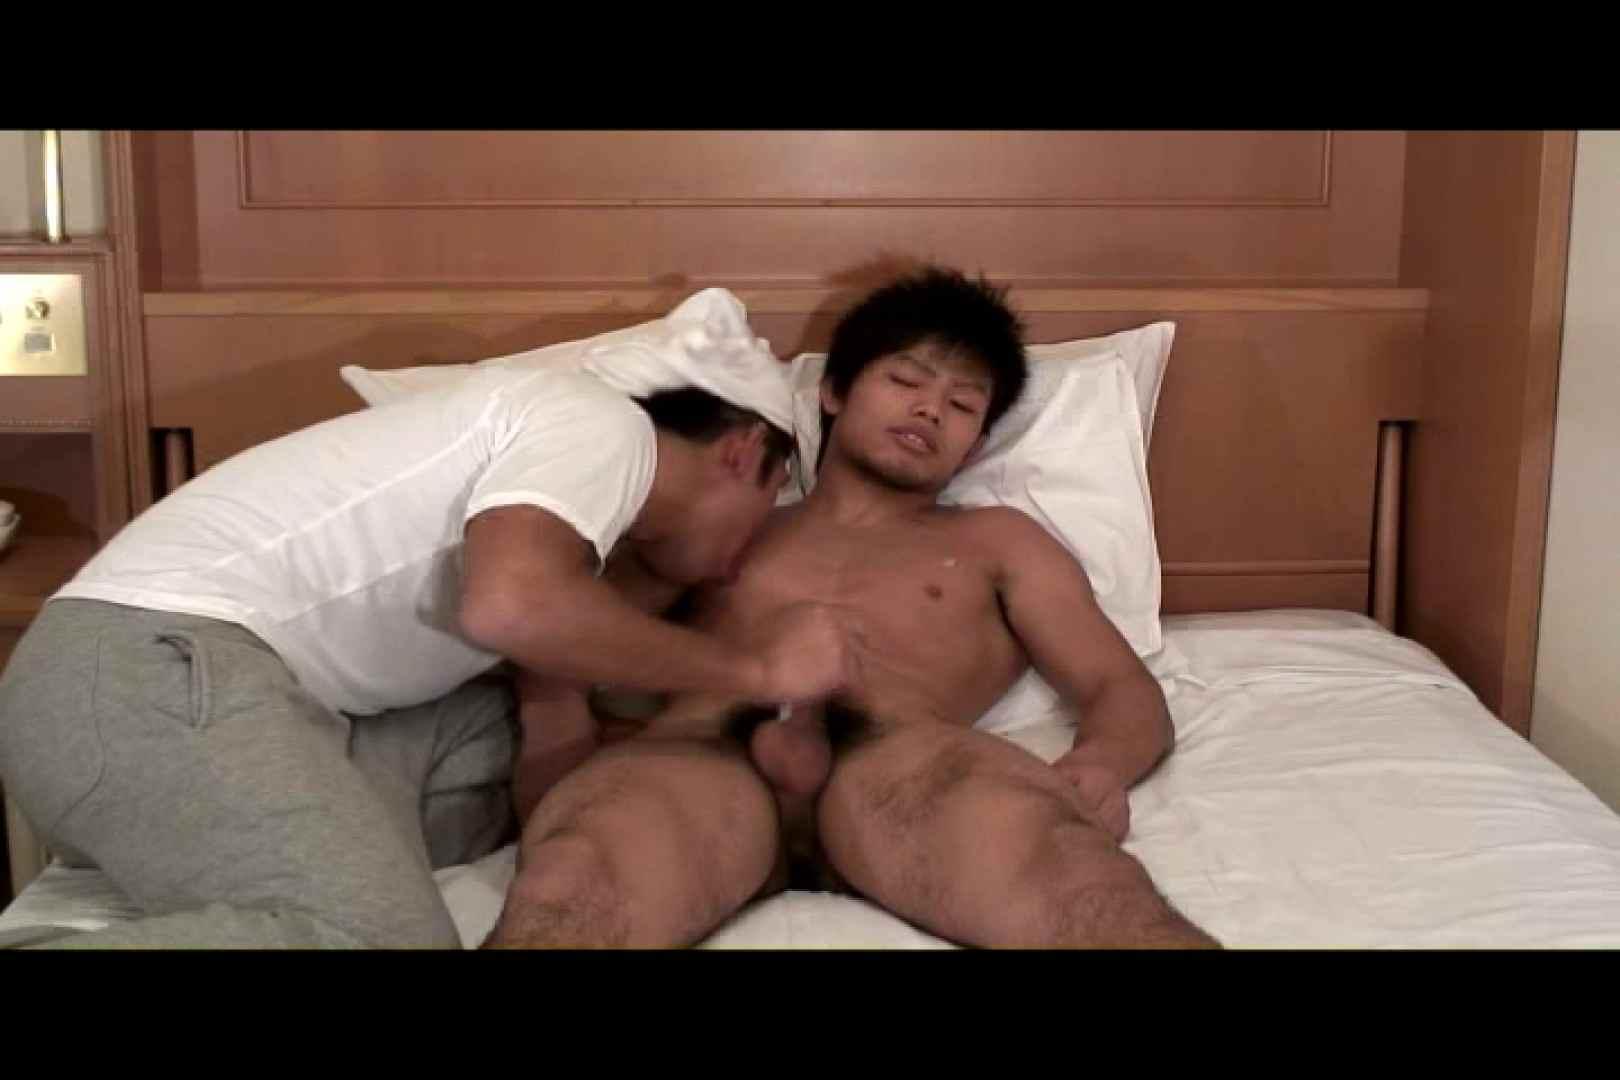 Bistro「イケメン」~Mokkori和風仕立て~vol.02 スポーツマン  57pic 15